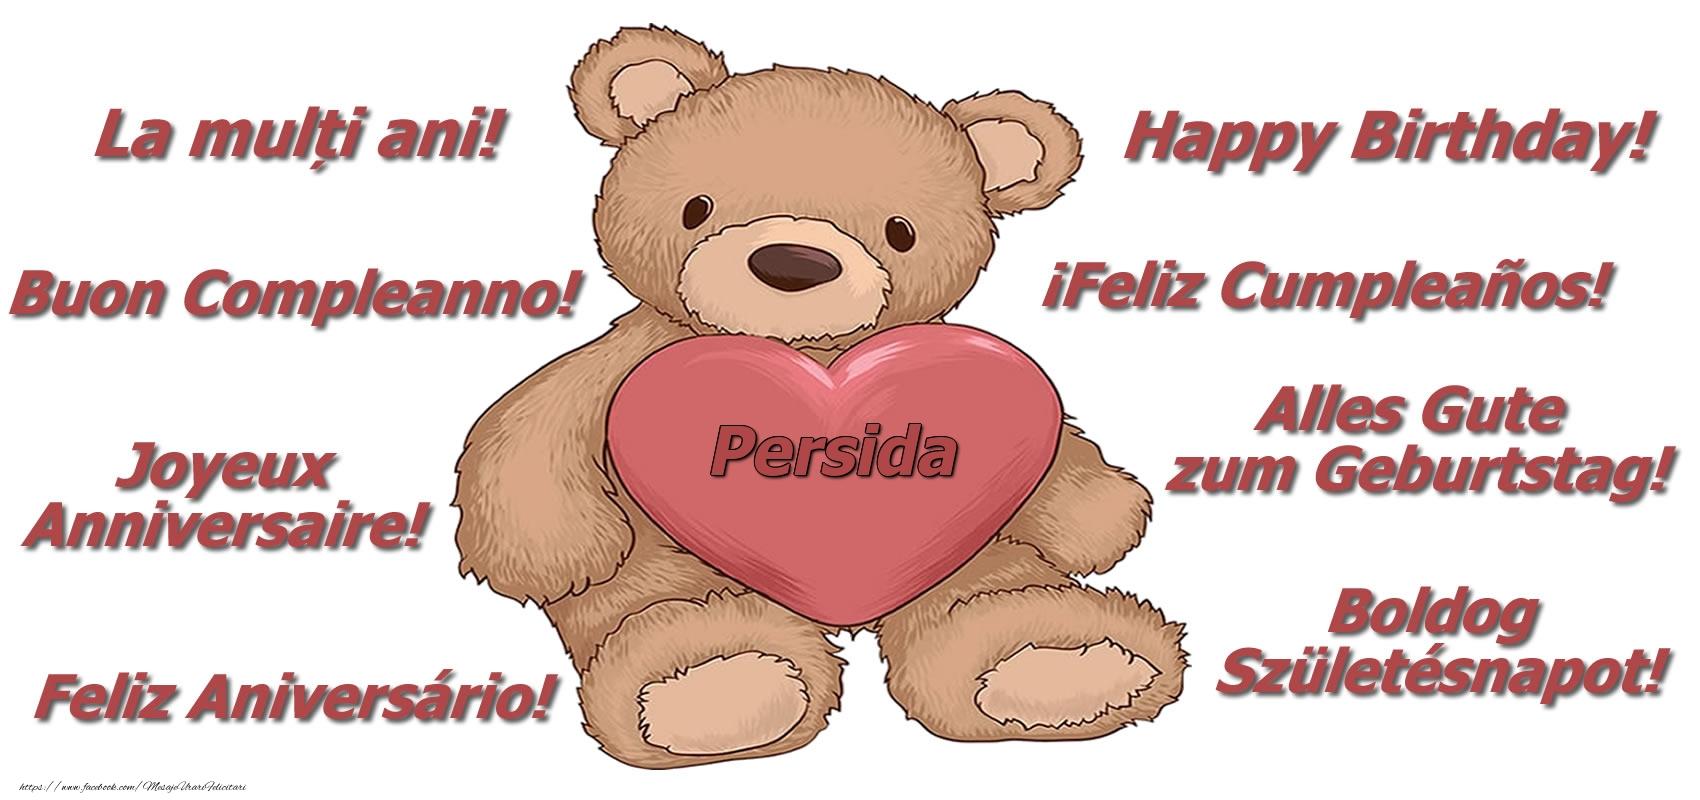 Felicitari de zi de nastere - La multi ani Persida! - Ursulet